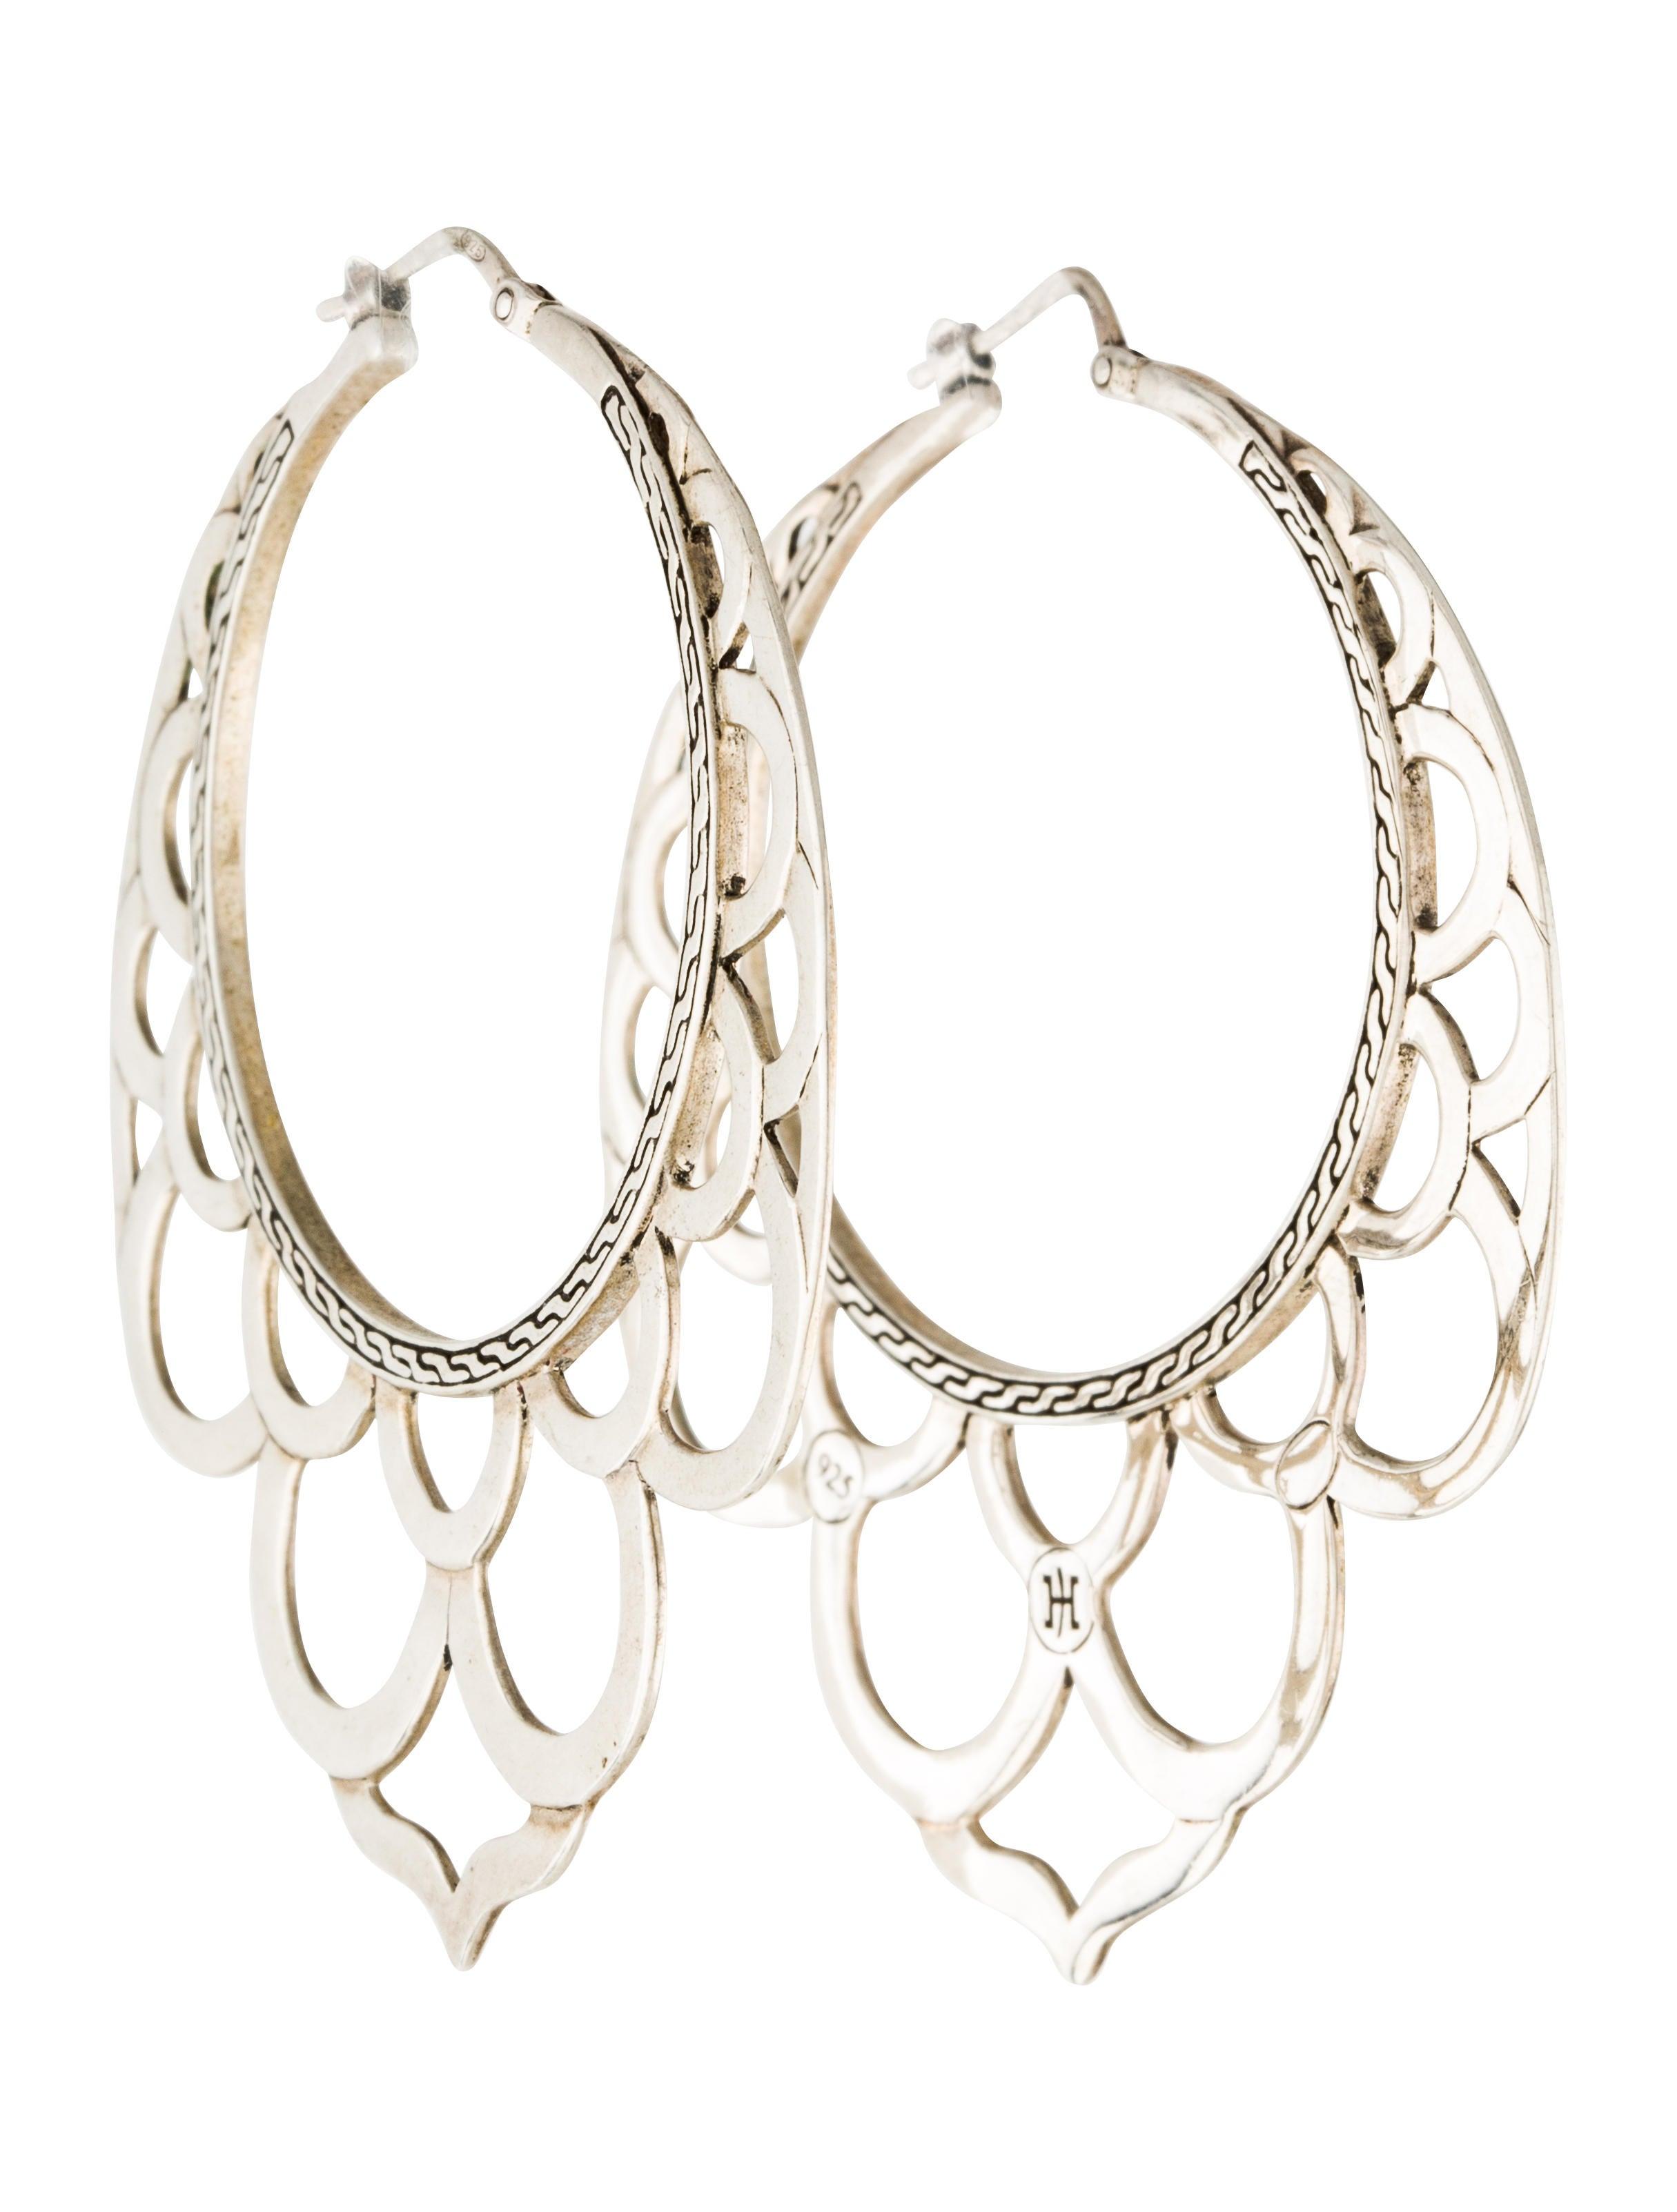 John hardy naga silver lace hoop earrings earrings for John hardy jewelry earrings